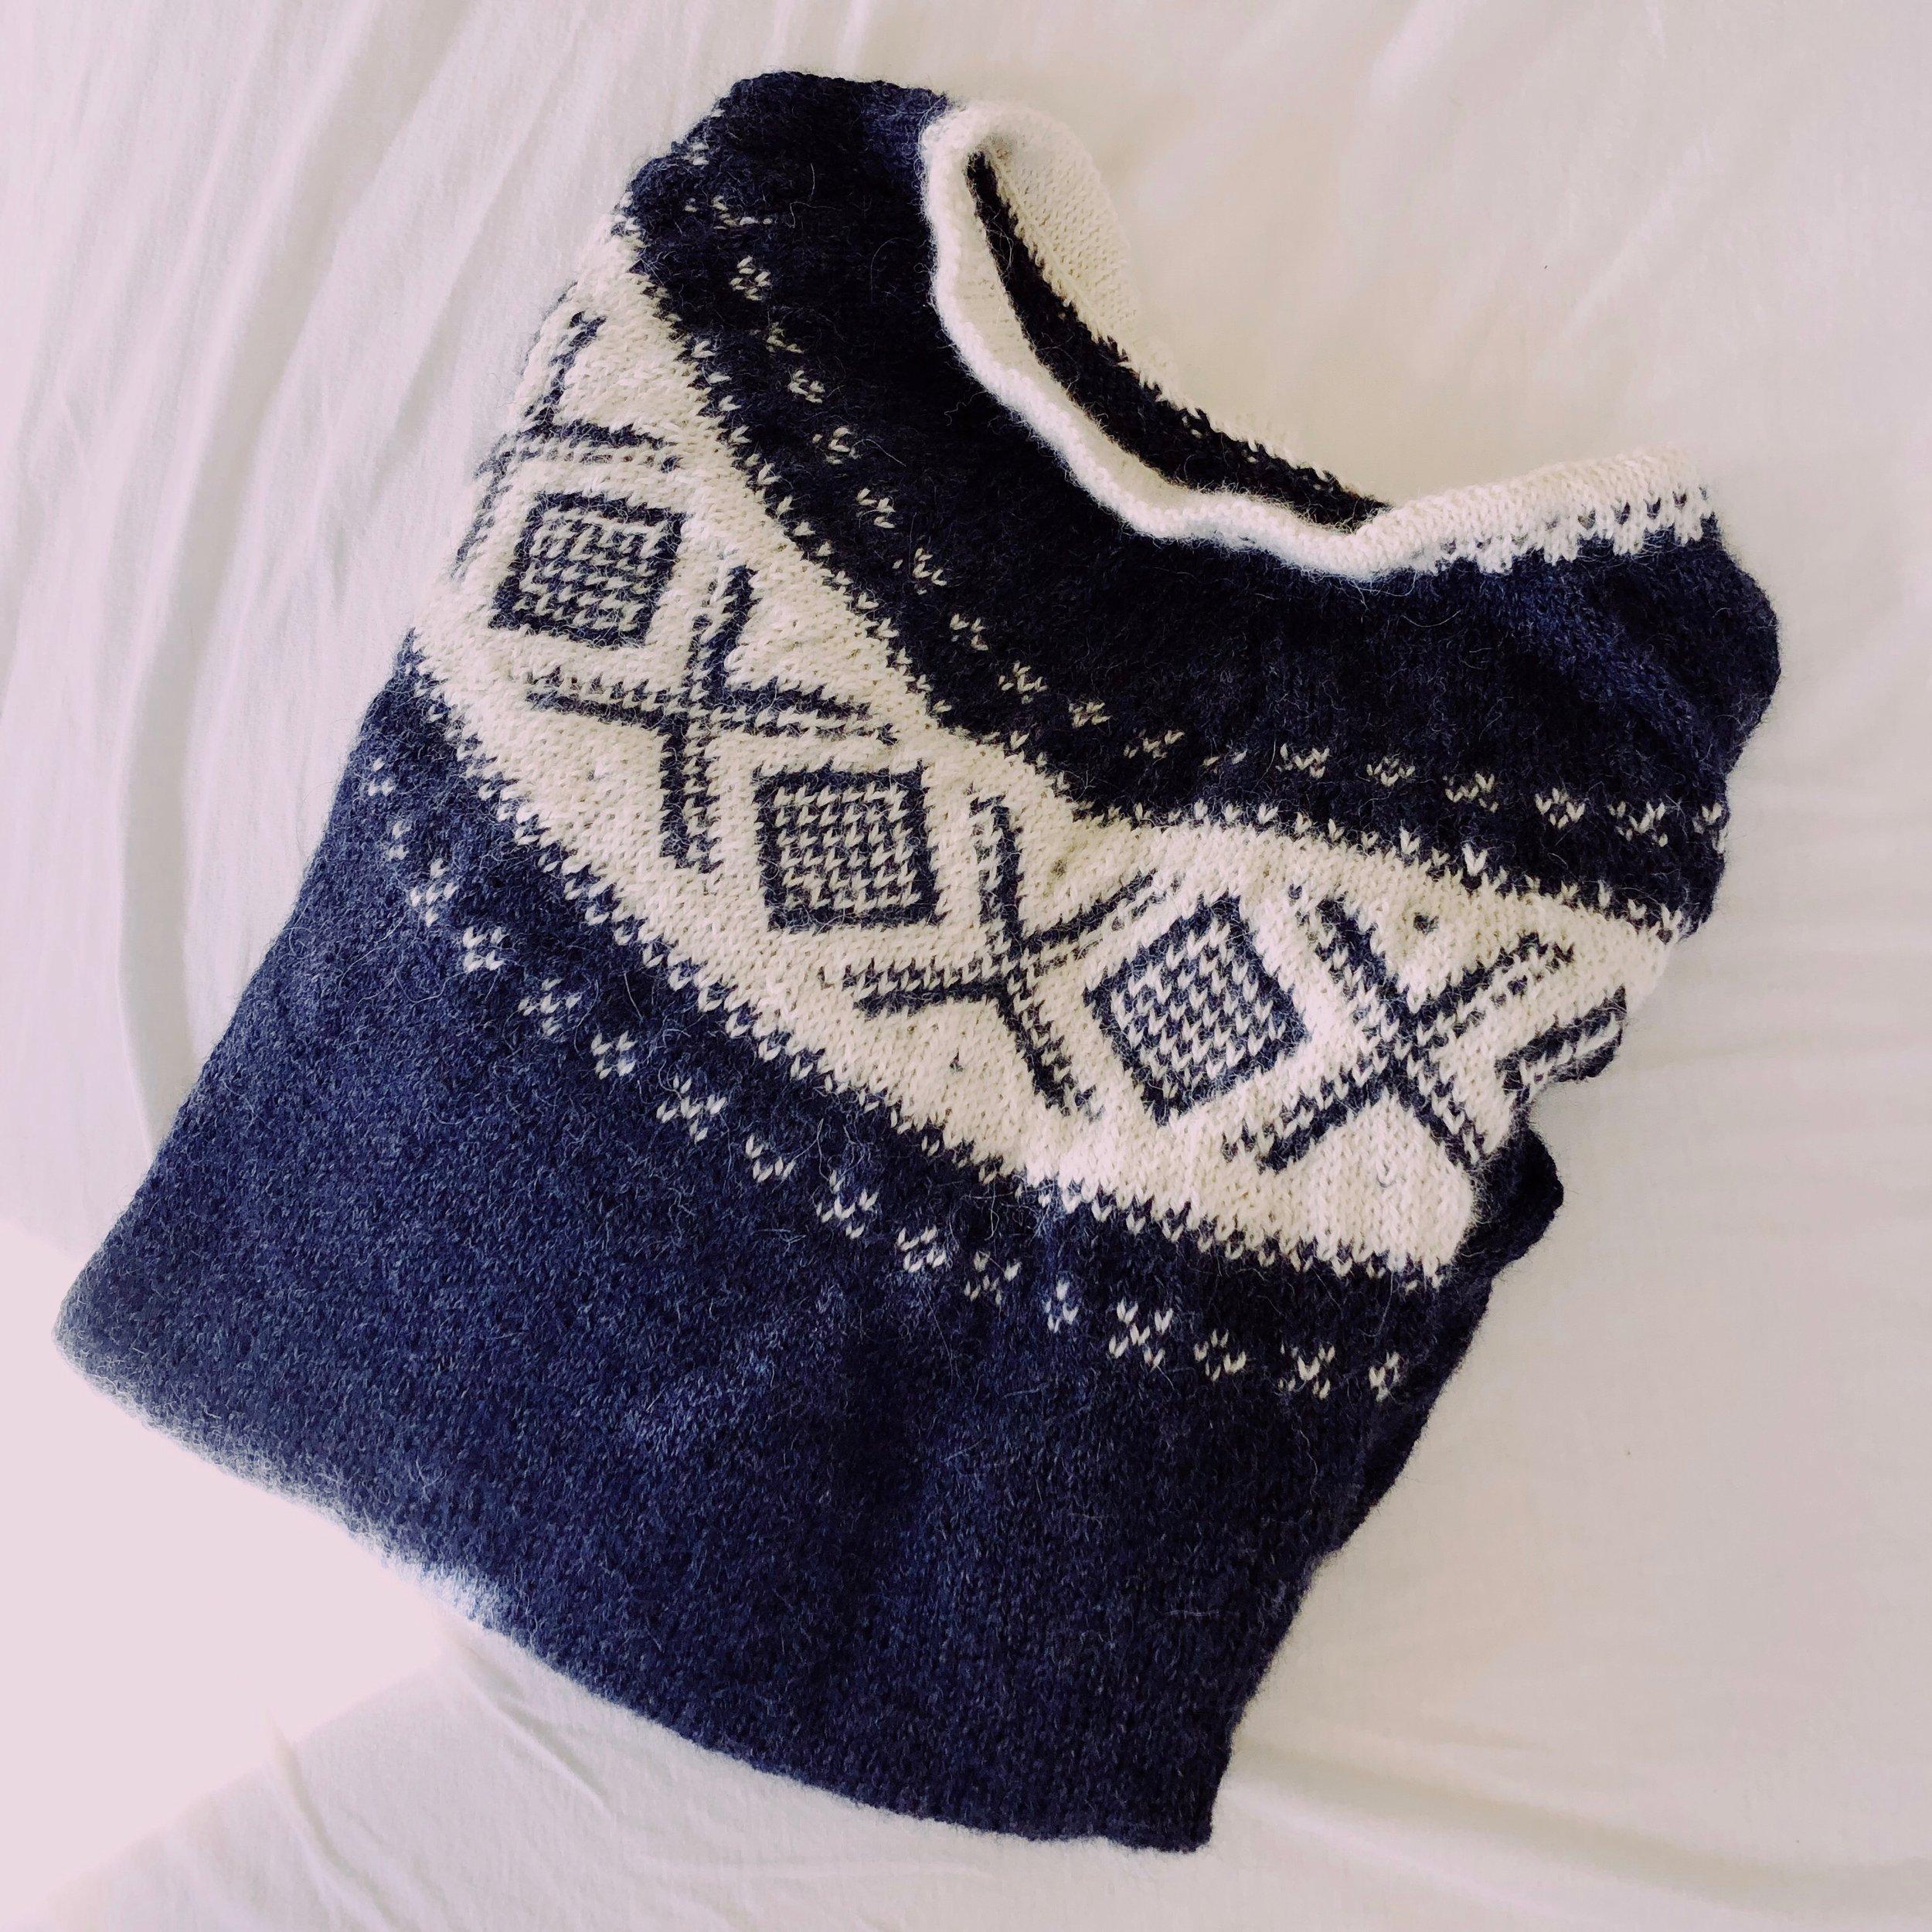 Dale Cortina genser - i alpakka forte-garn. Digg og mykt! Ikke helt perfekt, med halskant litt for stramt sydd og ulik strikkefasthet på mønsteret. Men sånn går det med første genser med mamma mange mil unna.